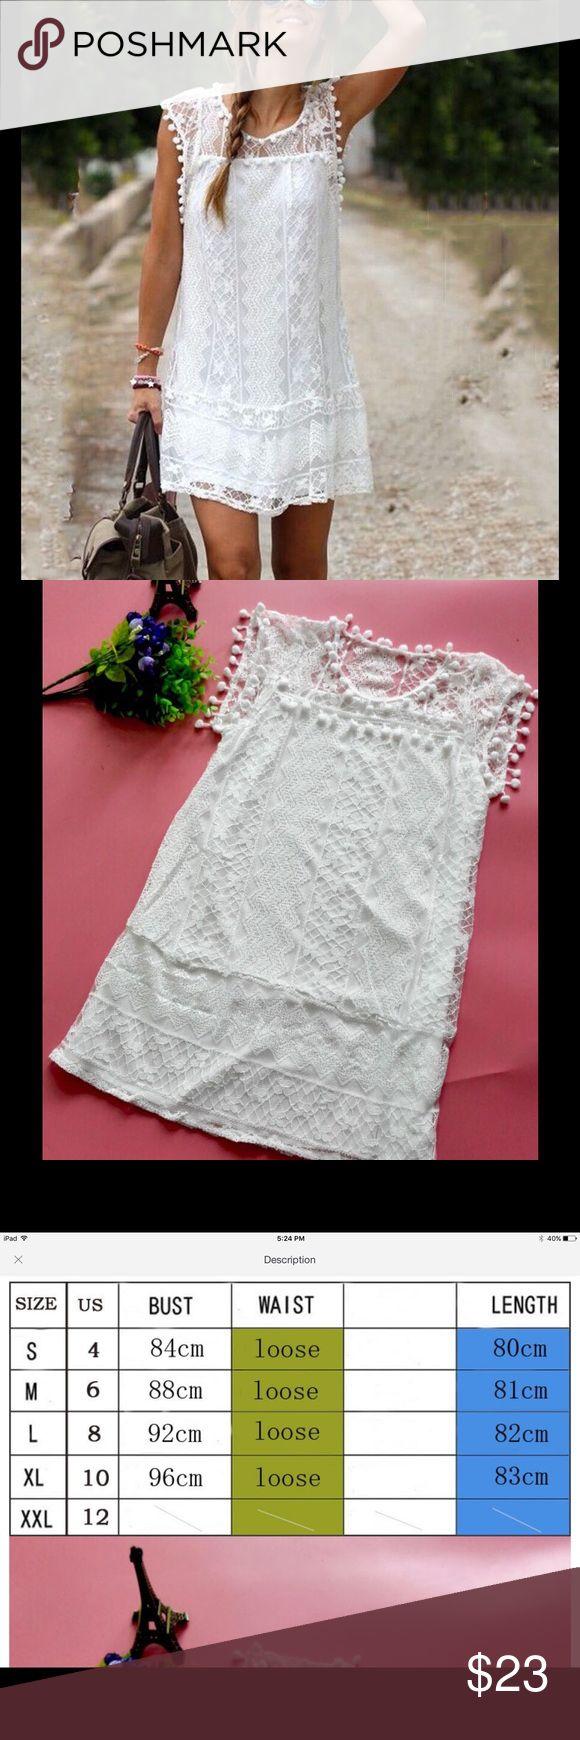 White Lace Mini Dress I grave S,M,L and XL. Please check the last photo for sizes and measurements Dresses Mini